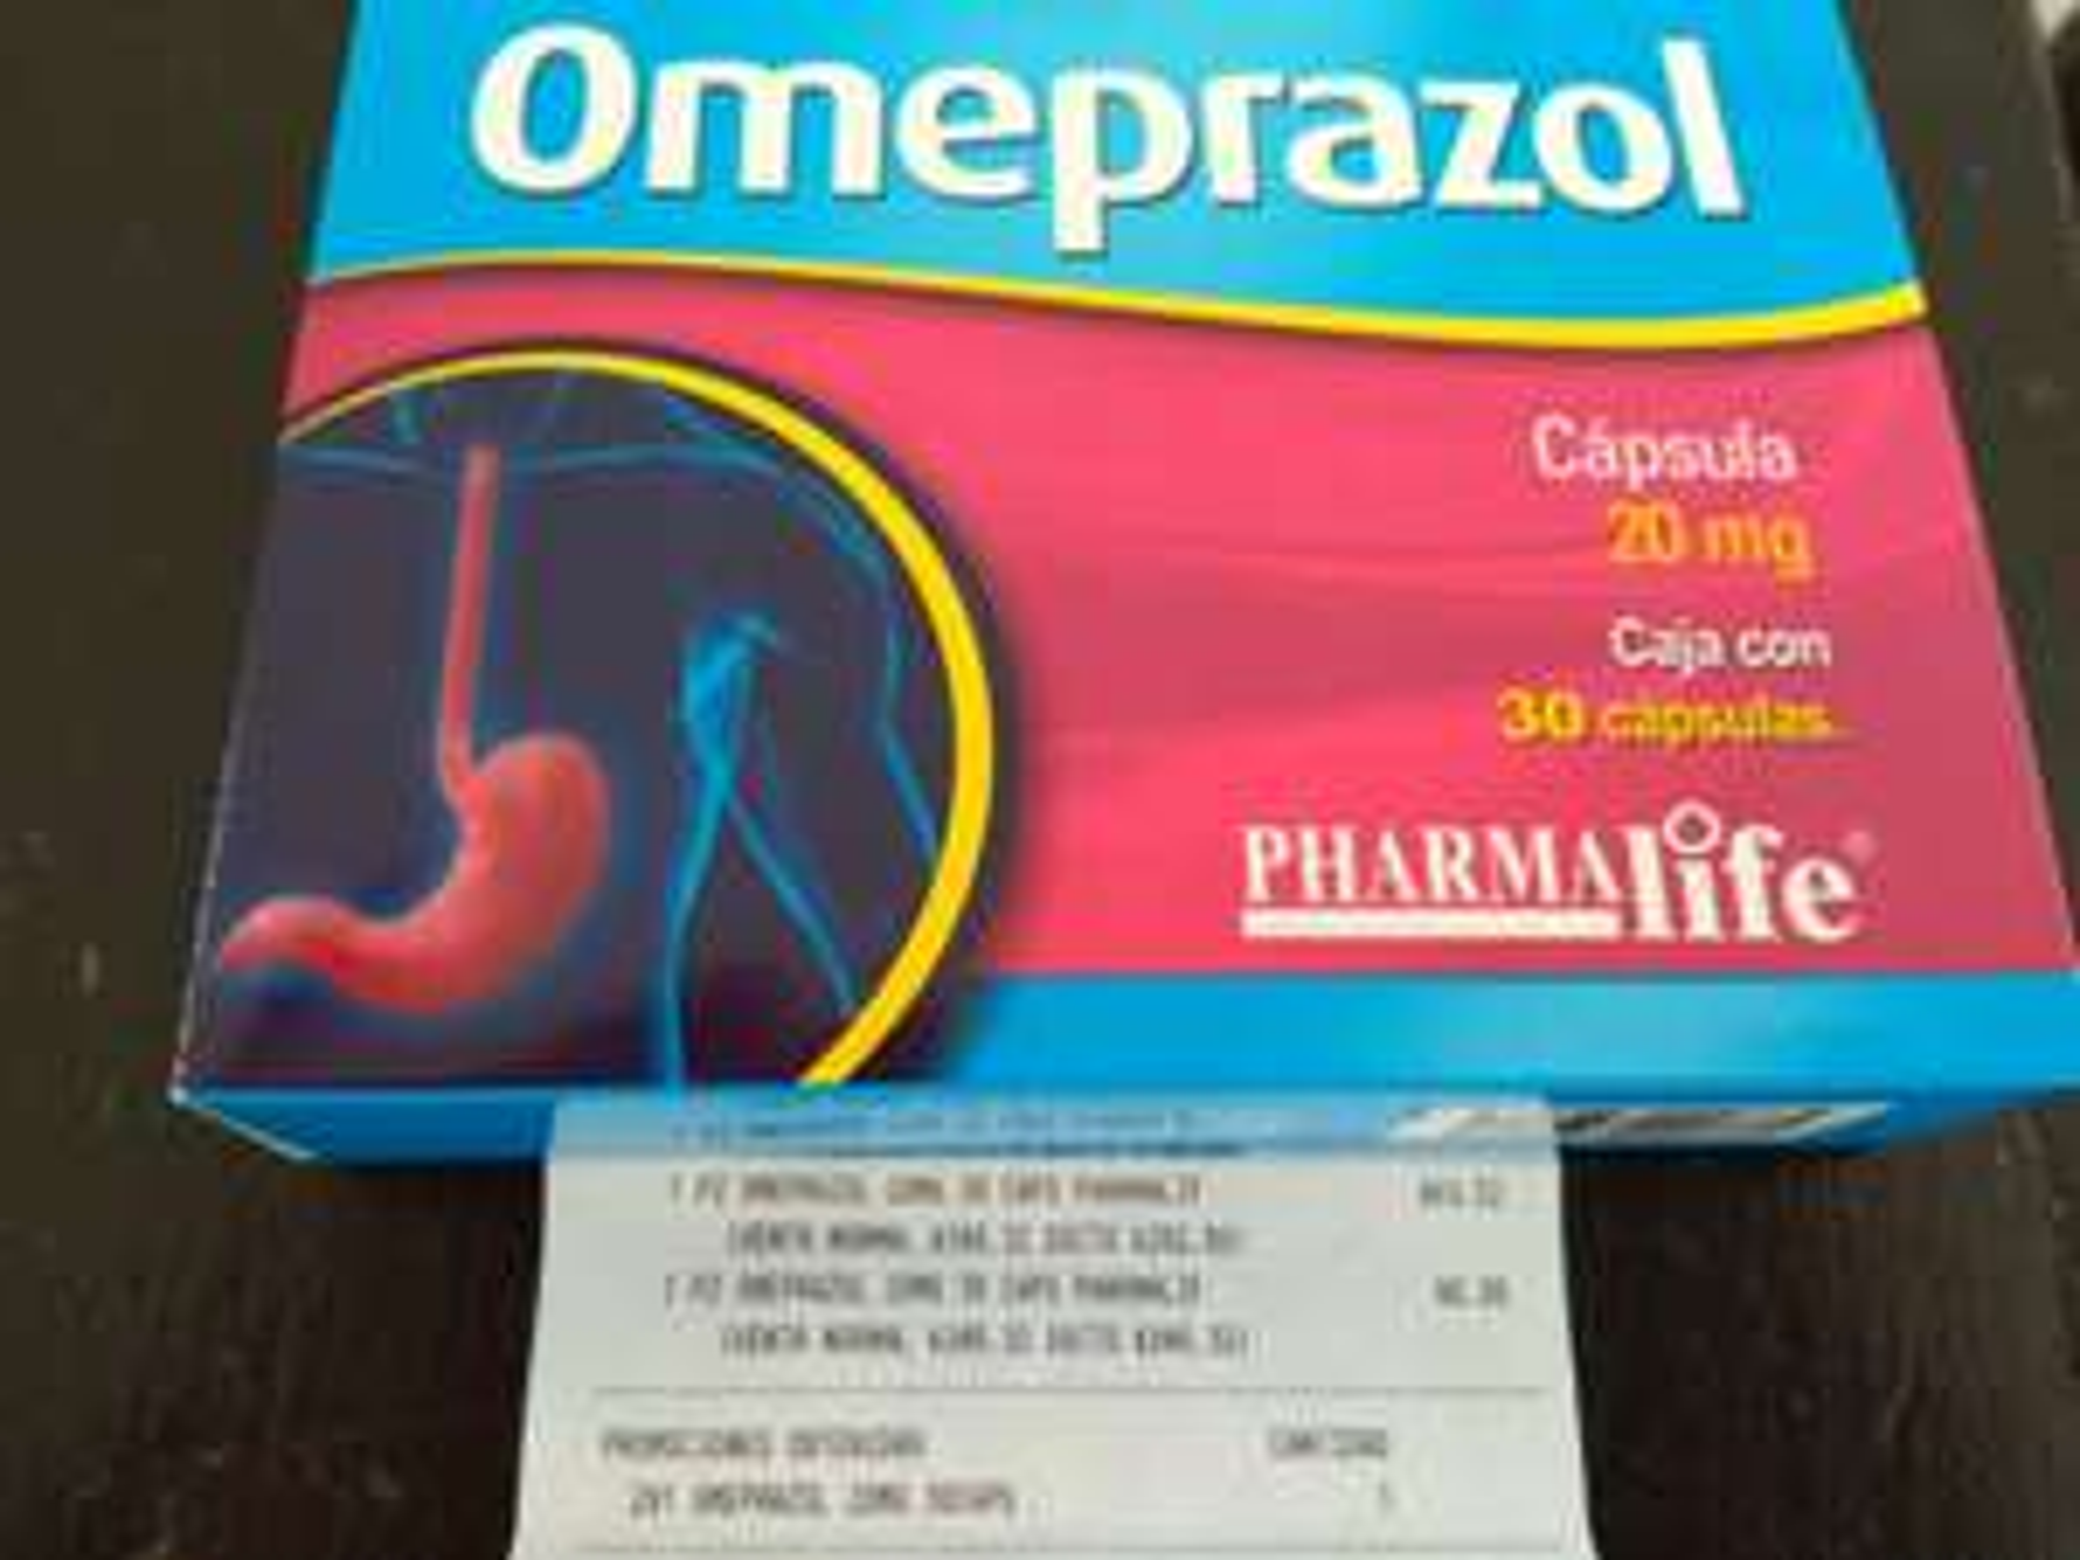 Omeprazol 2x1 Farmacias Guadalajara